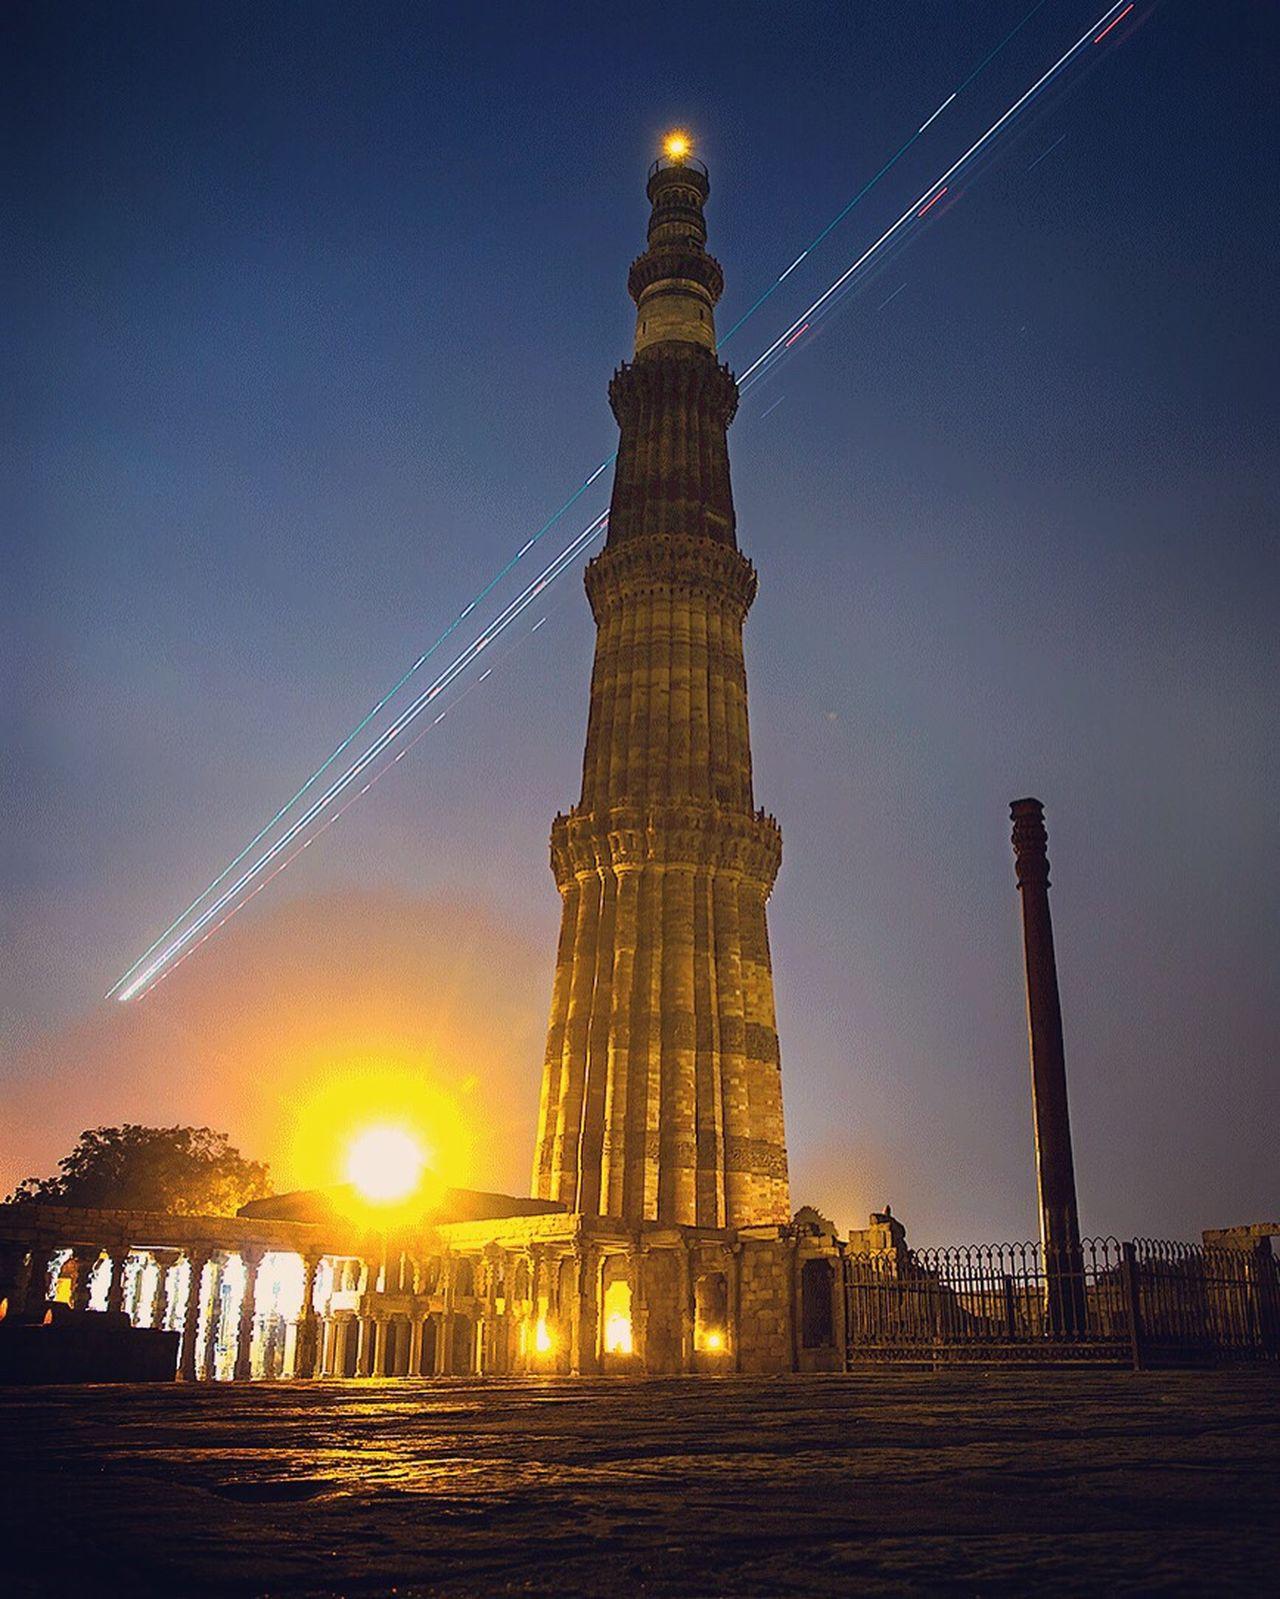 Check This Out Qutabminar Lighttrails Nightphotography Longexposure Longexposurephotography Delhi DelhiGram Delhidiaries Delhimonument Indianhistory Indianheritage Mustvisit